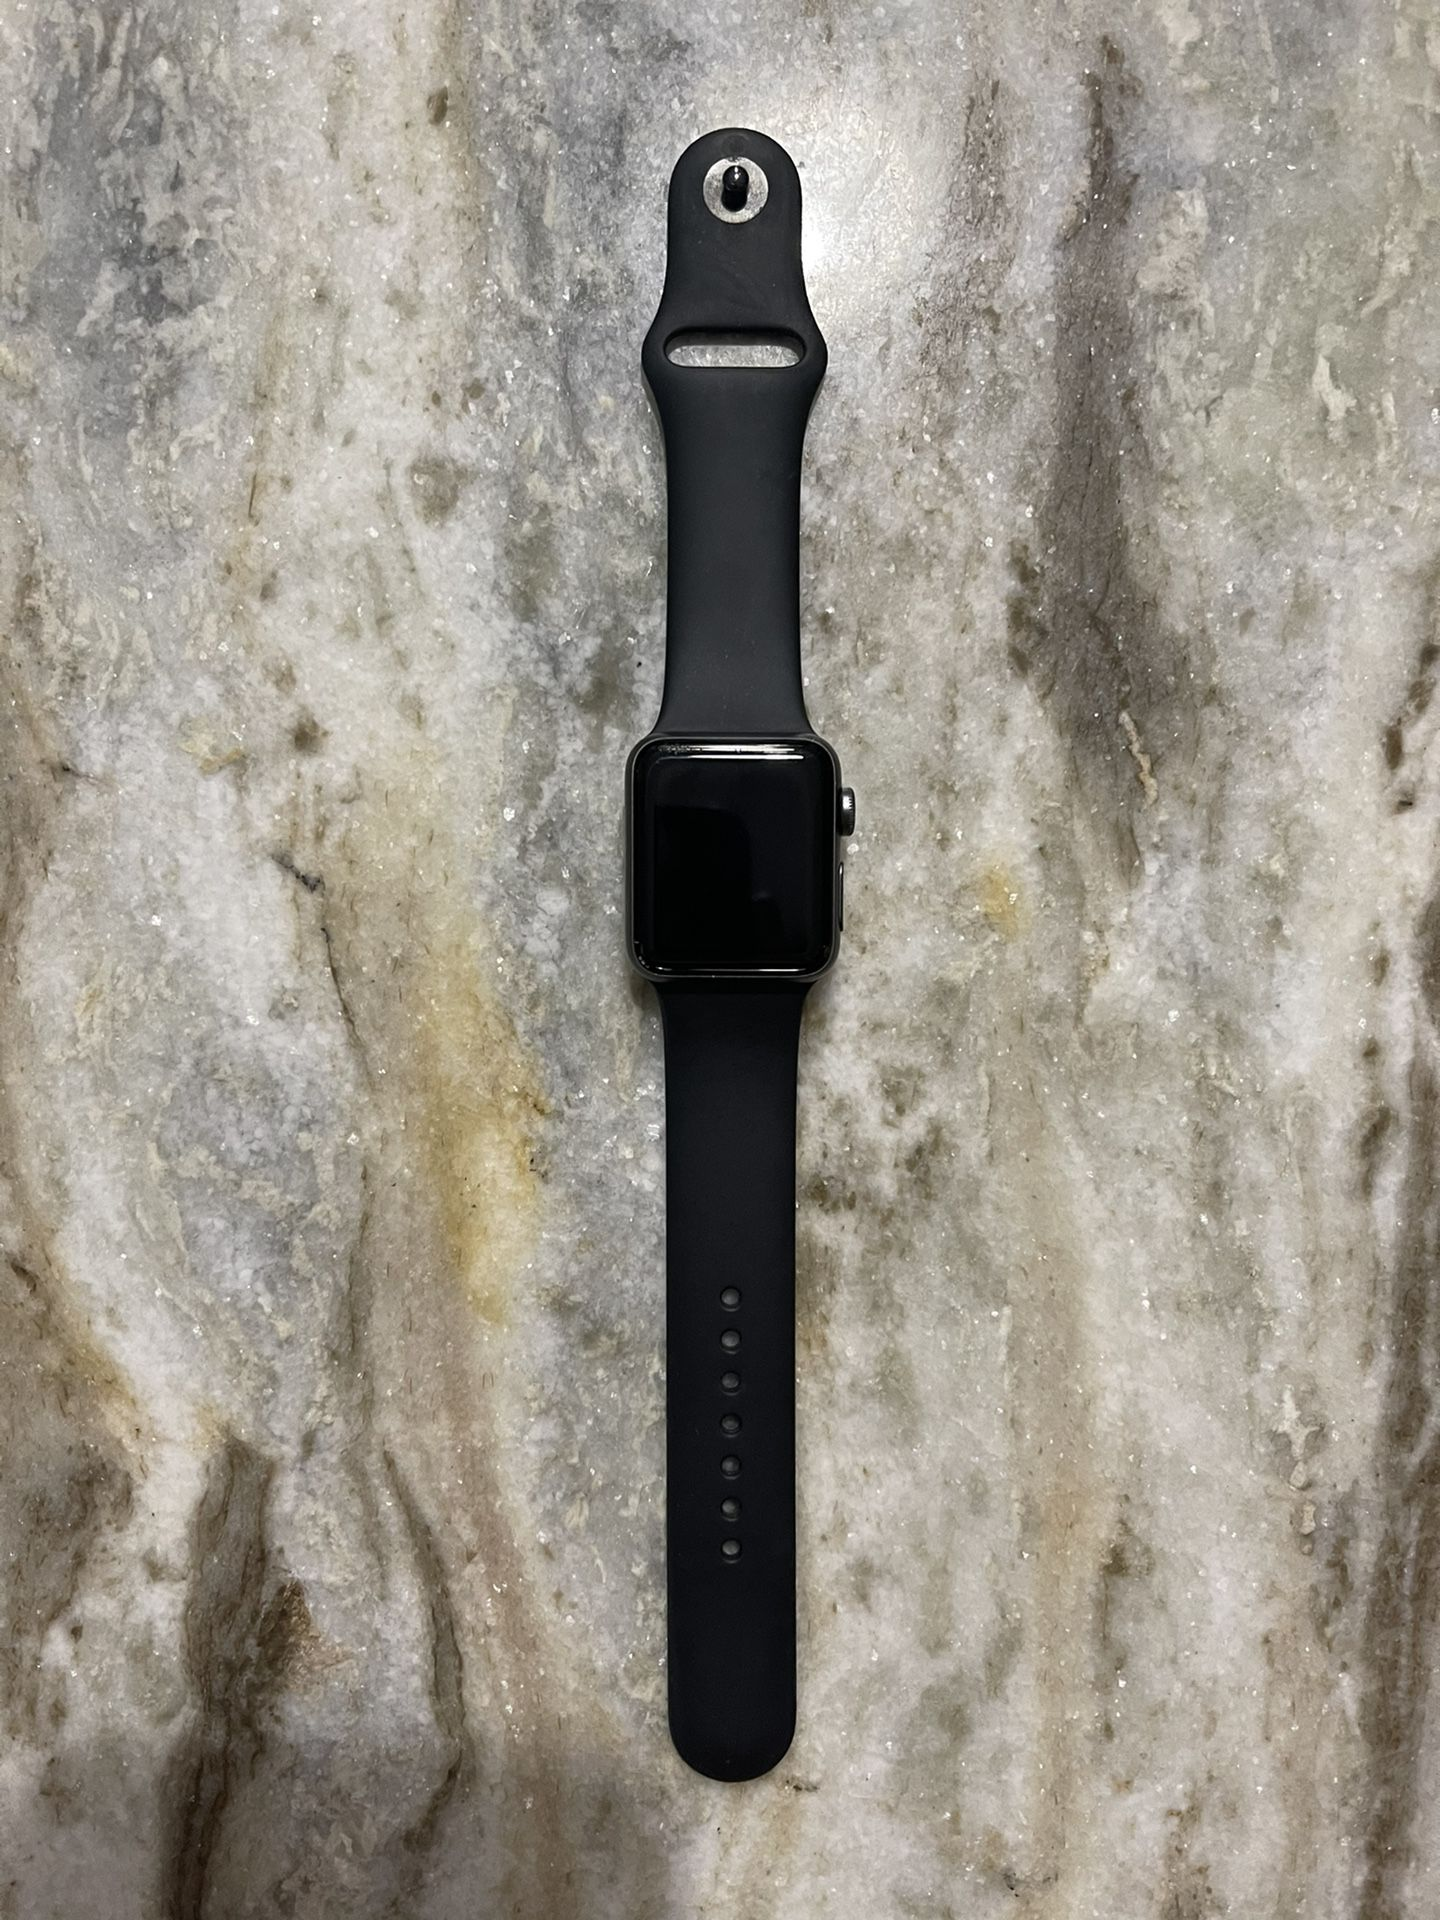 Apple Watch Series 3 Space Gray (black)